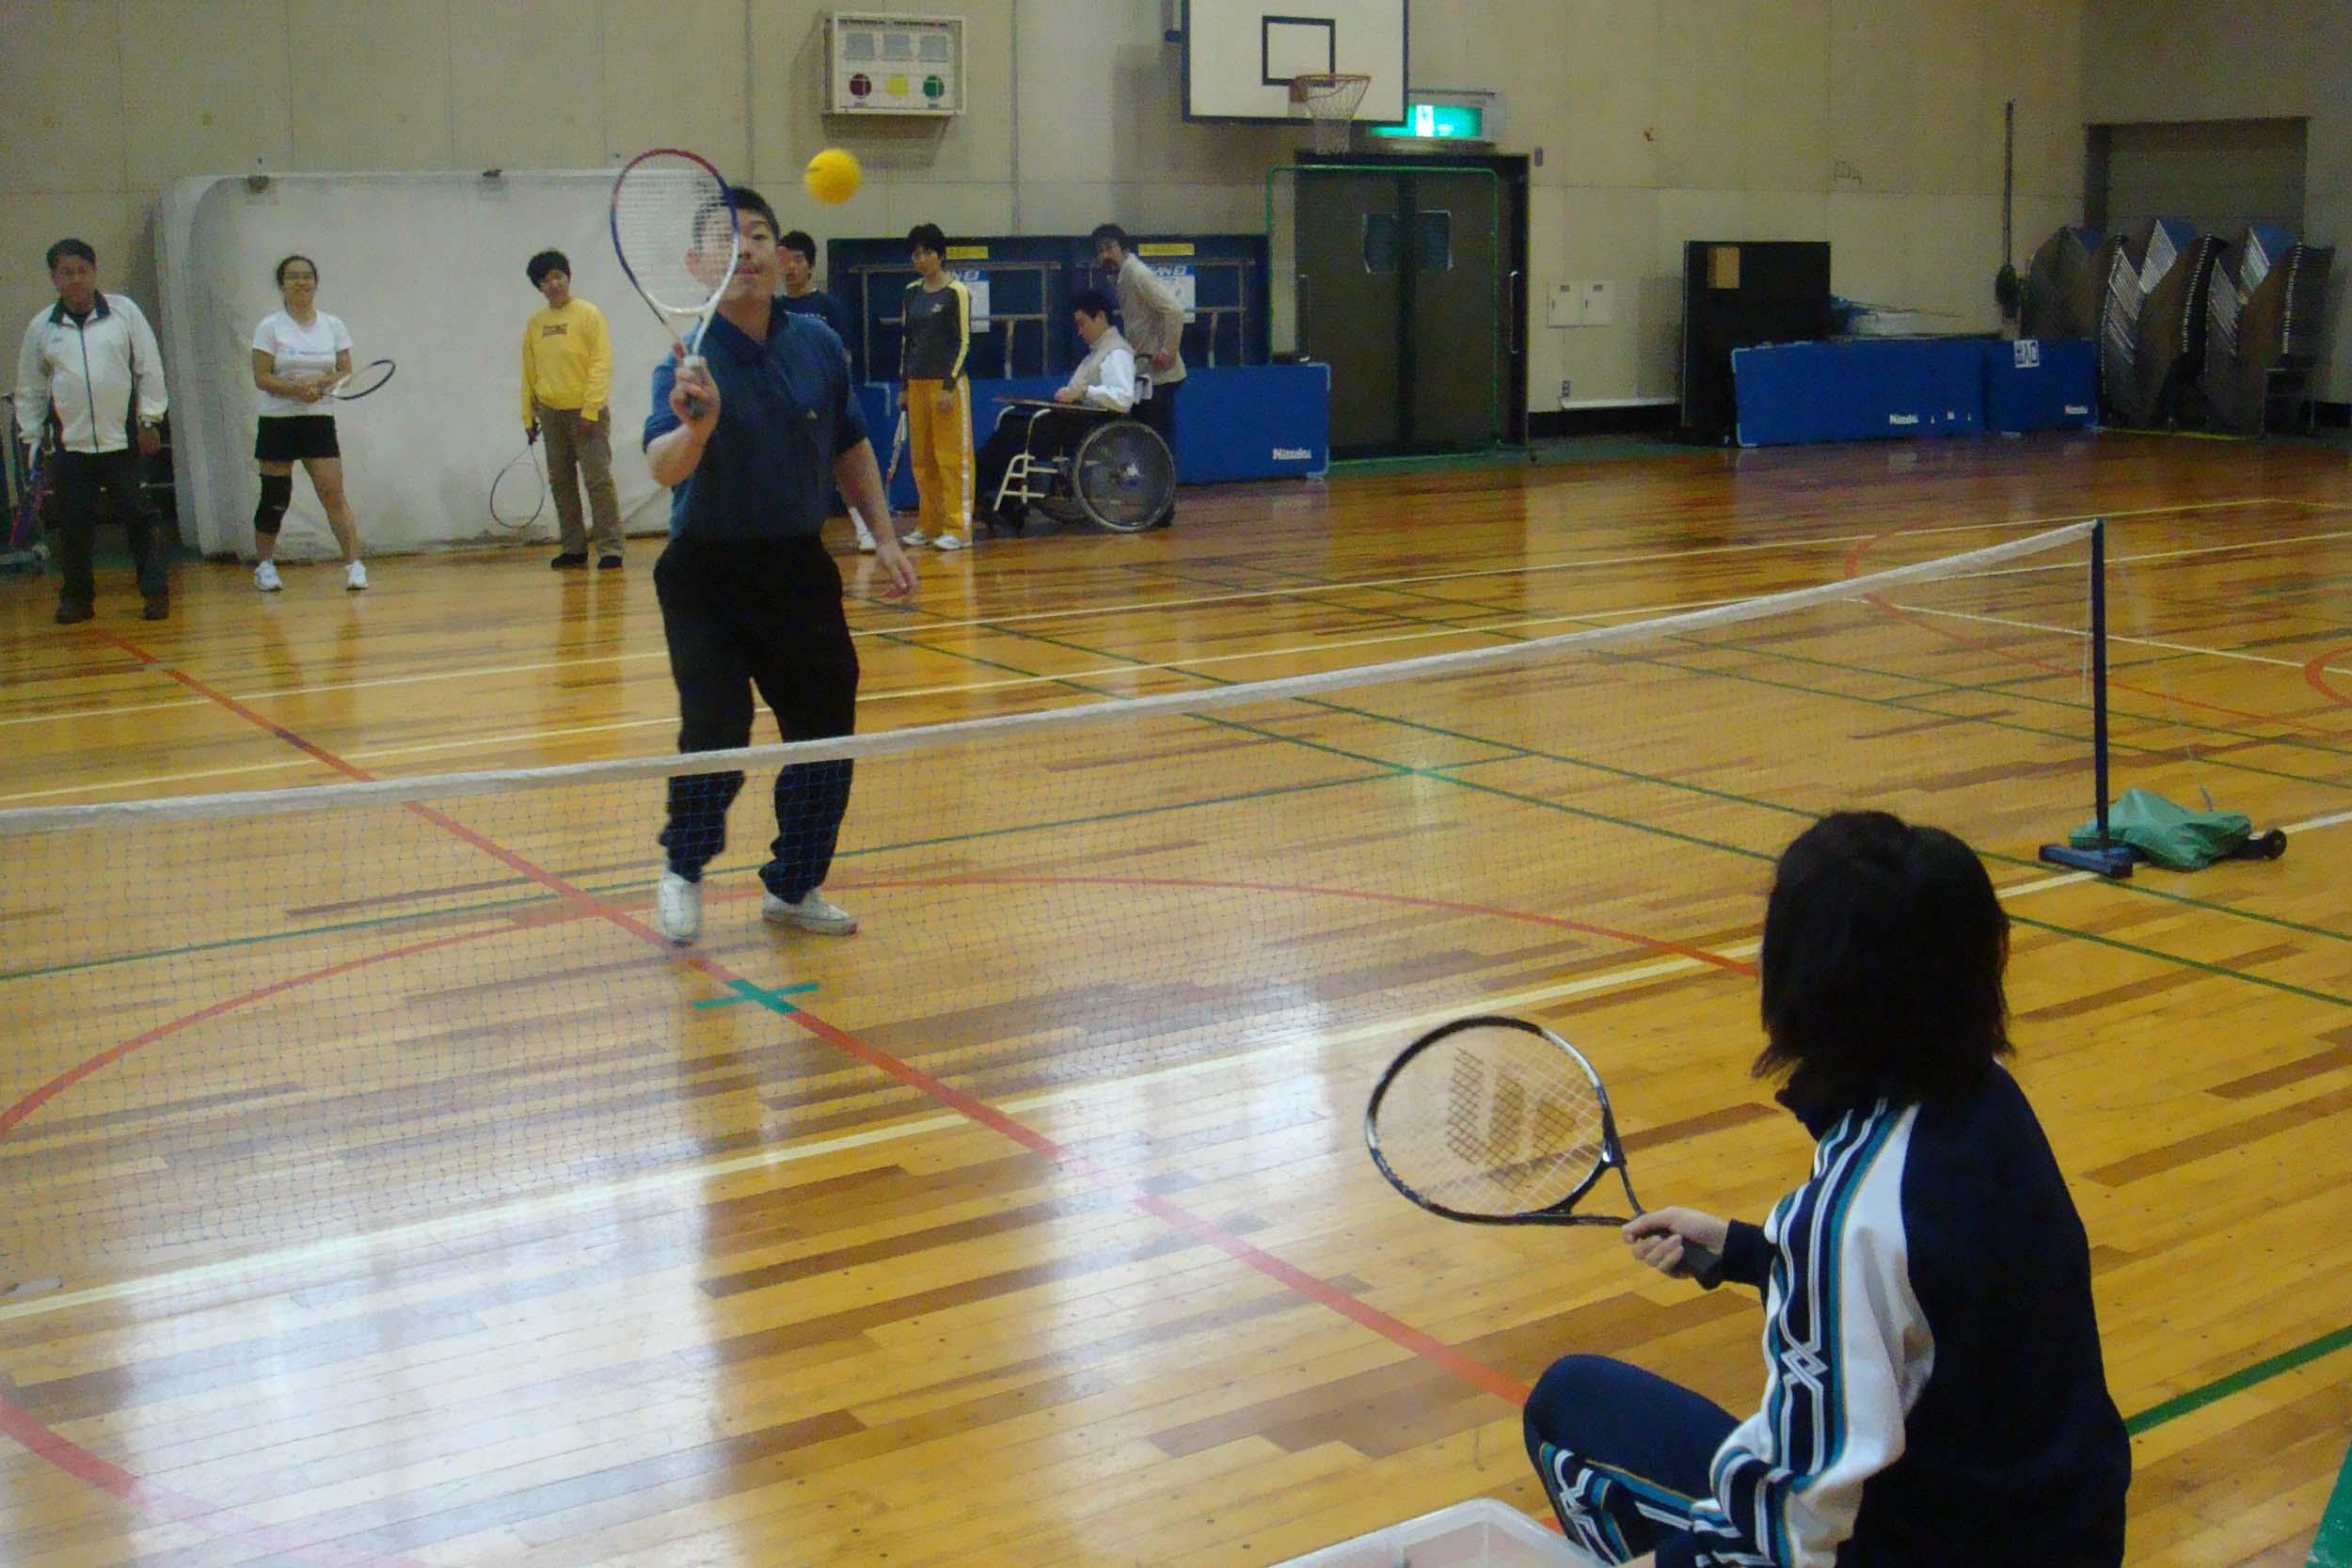 tenisu - スポーツ体験教室より・・・テニスとサッカーです!!